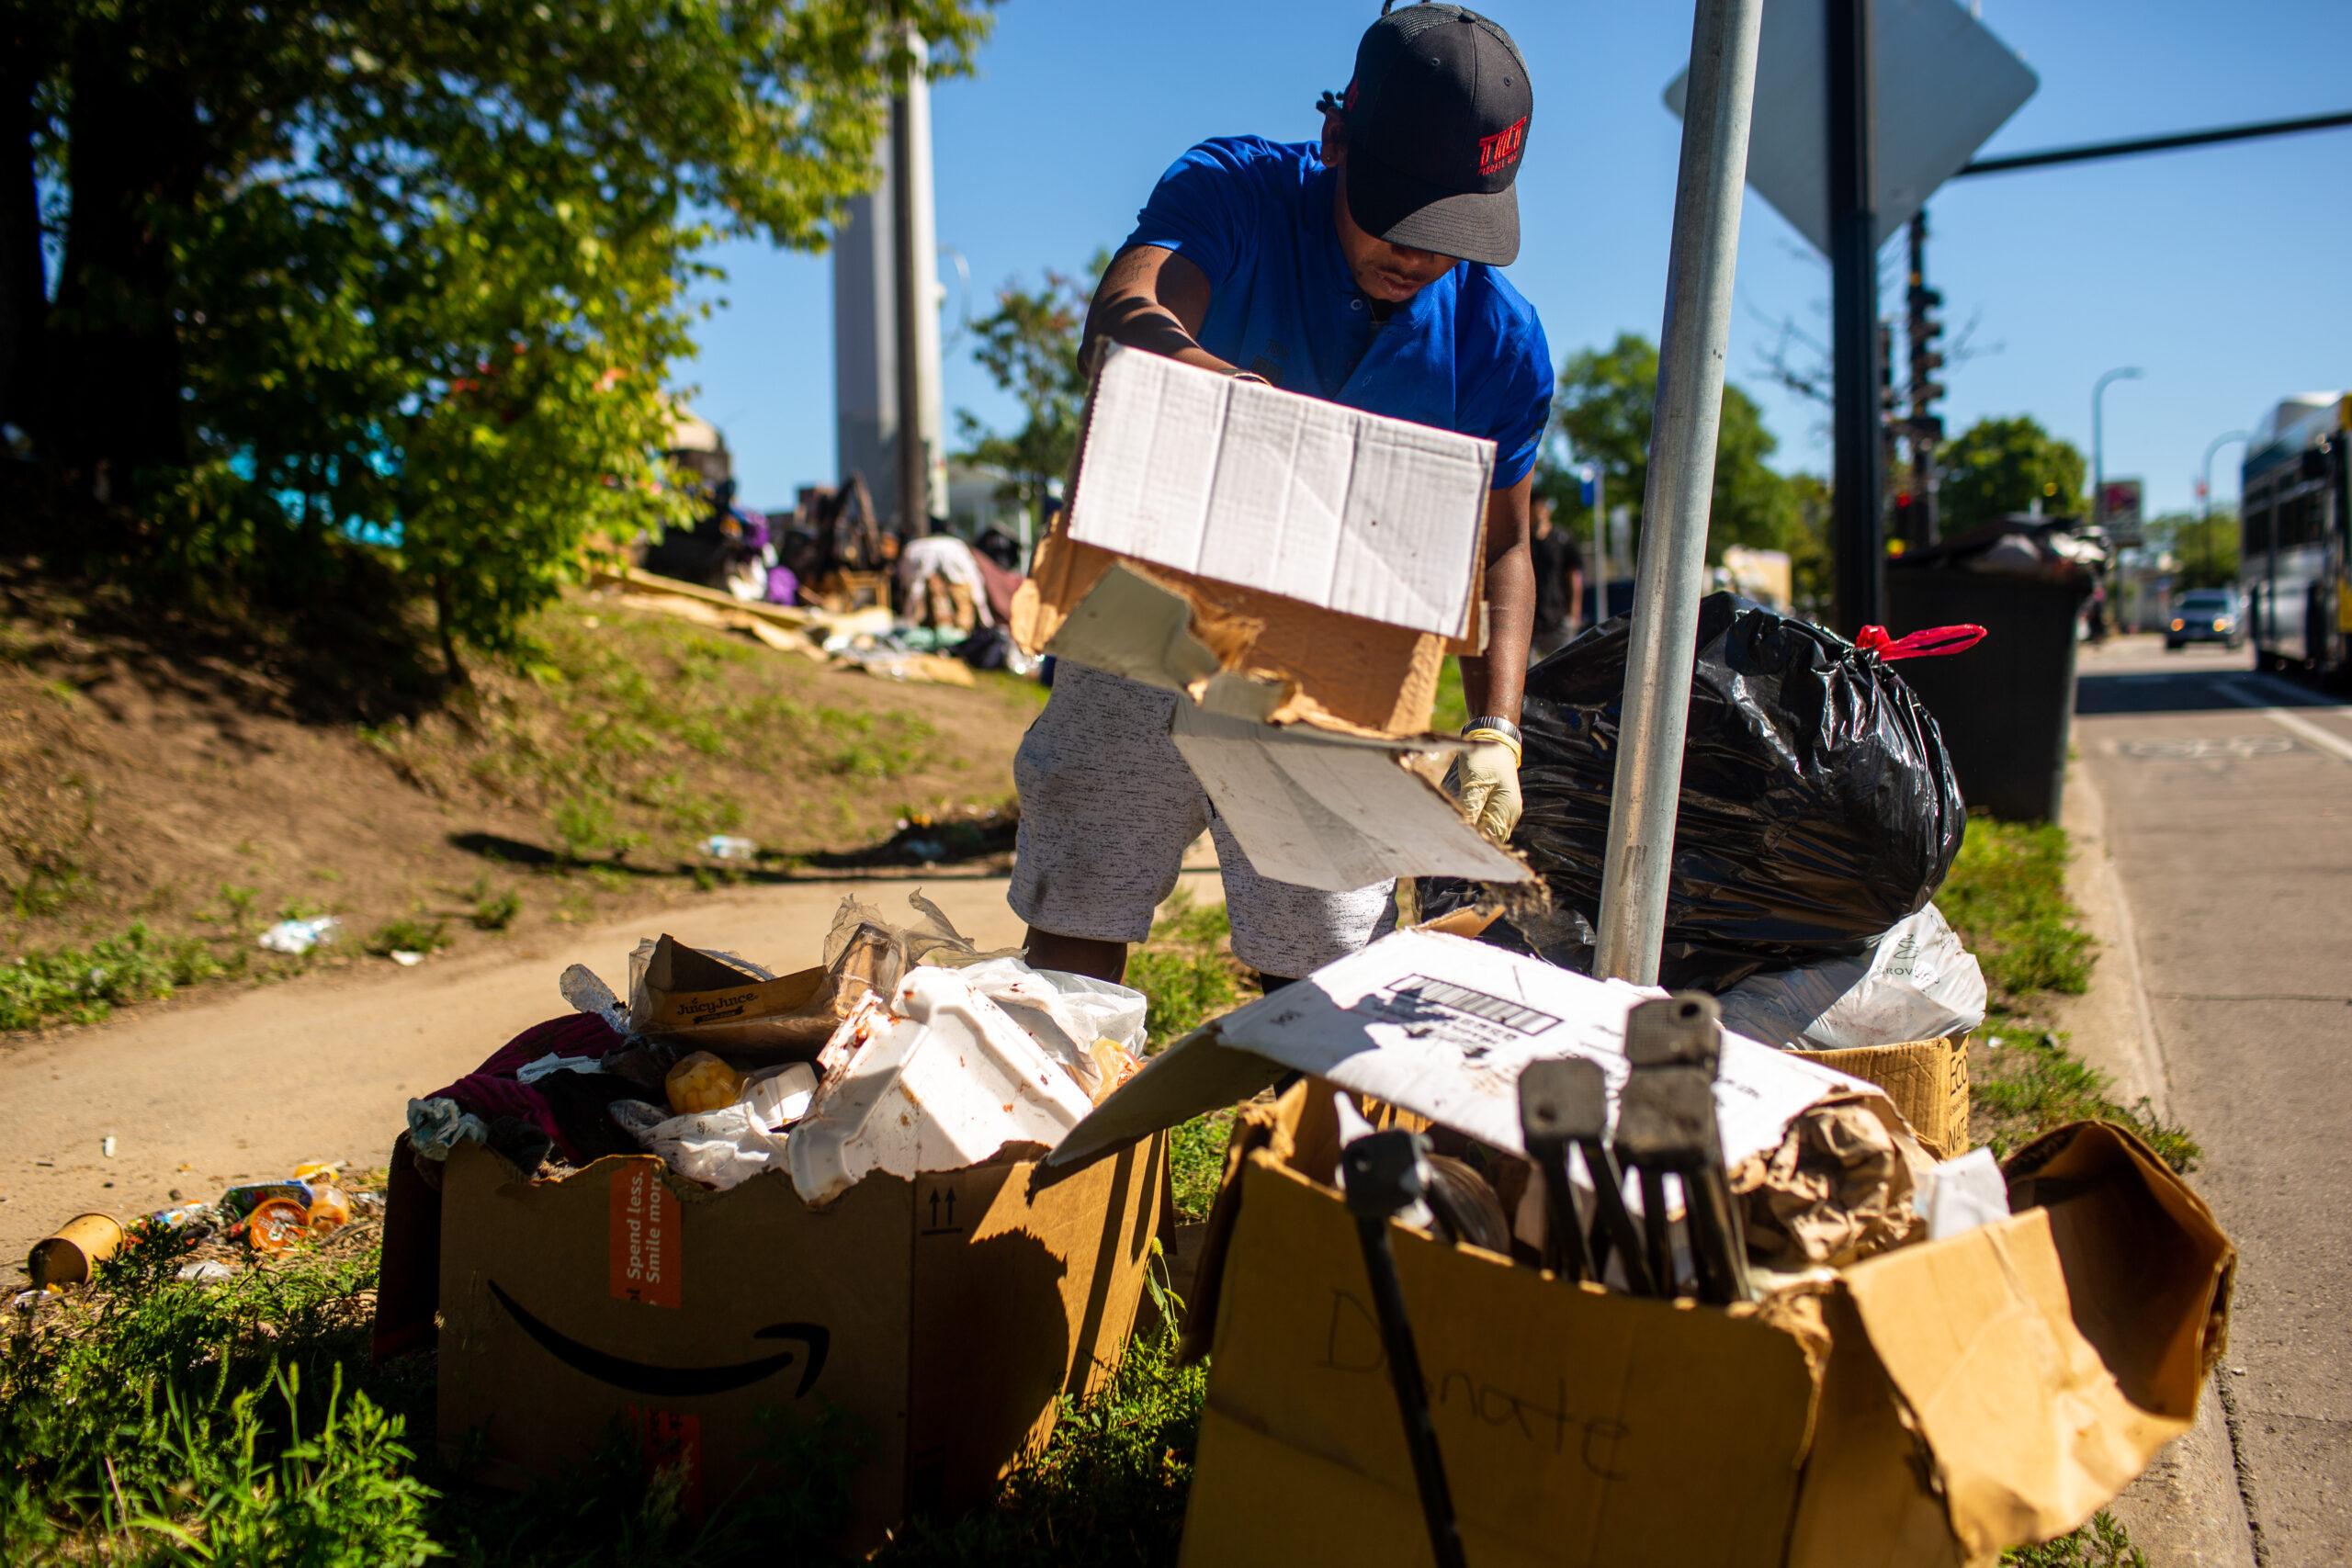 Indigenous leaders alarmed at chaos of growing Franklin Street encampment